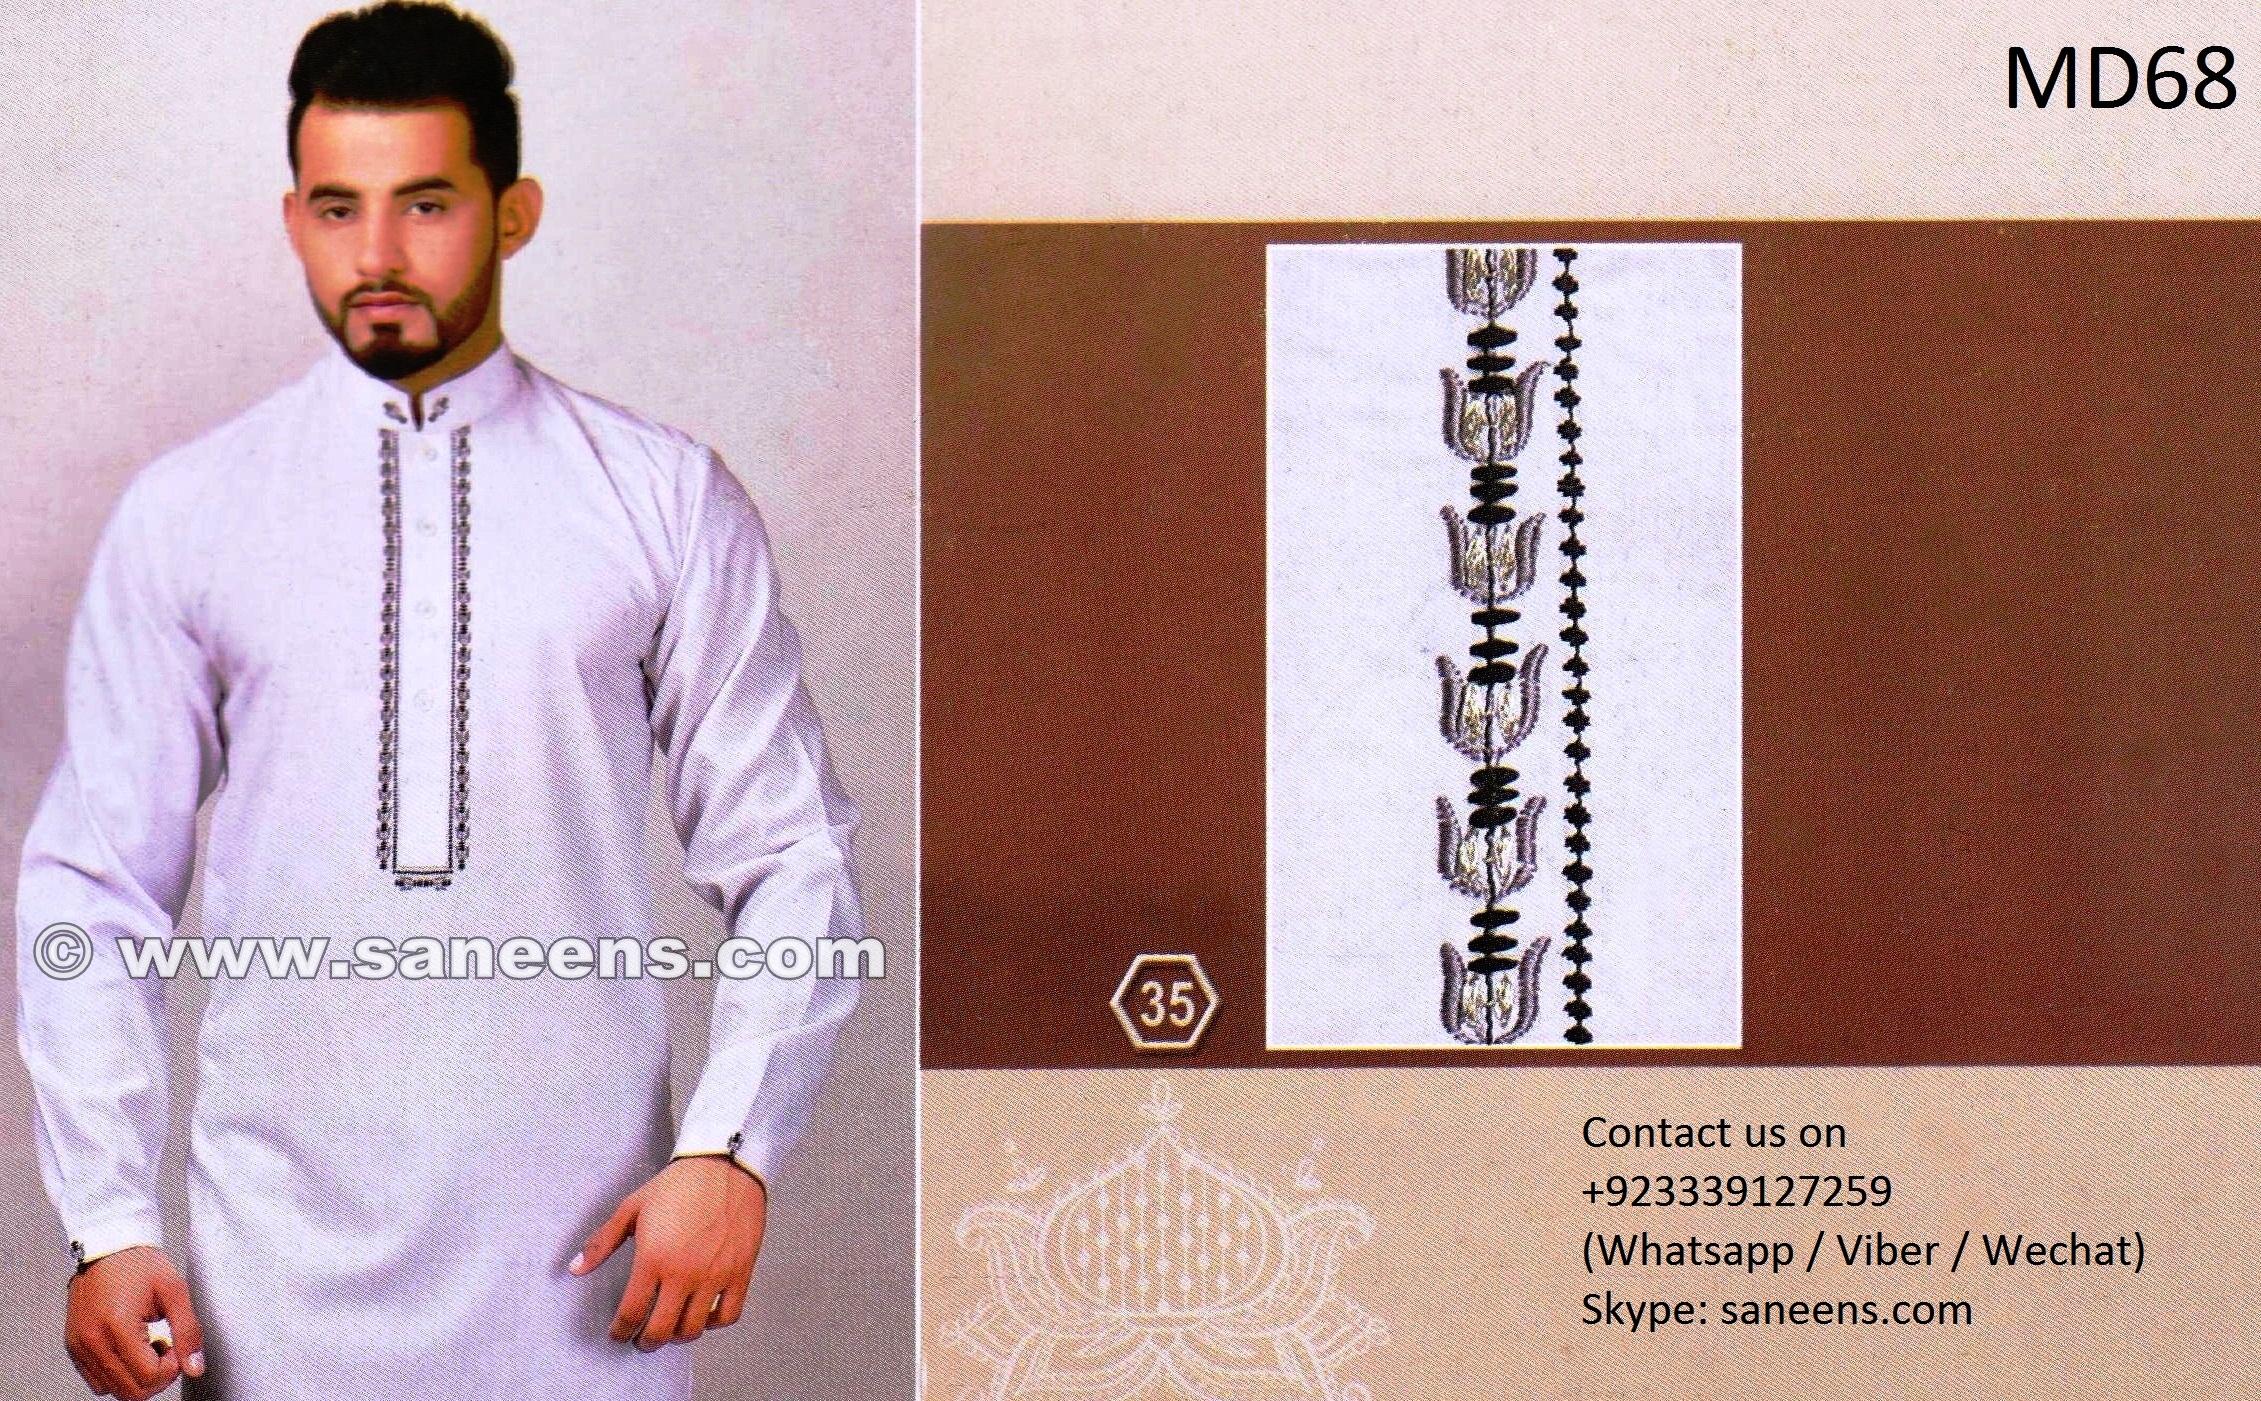 md68-karachi-embroidery-vol-2.jpg